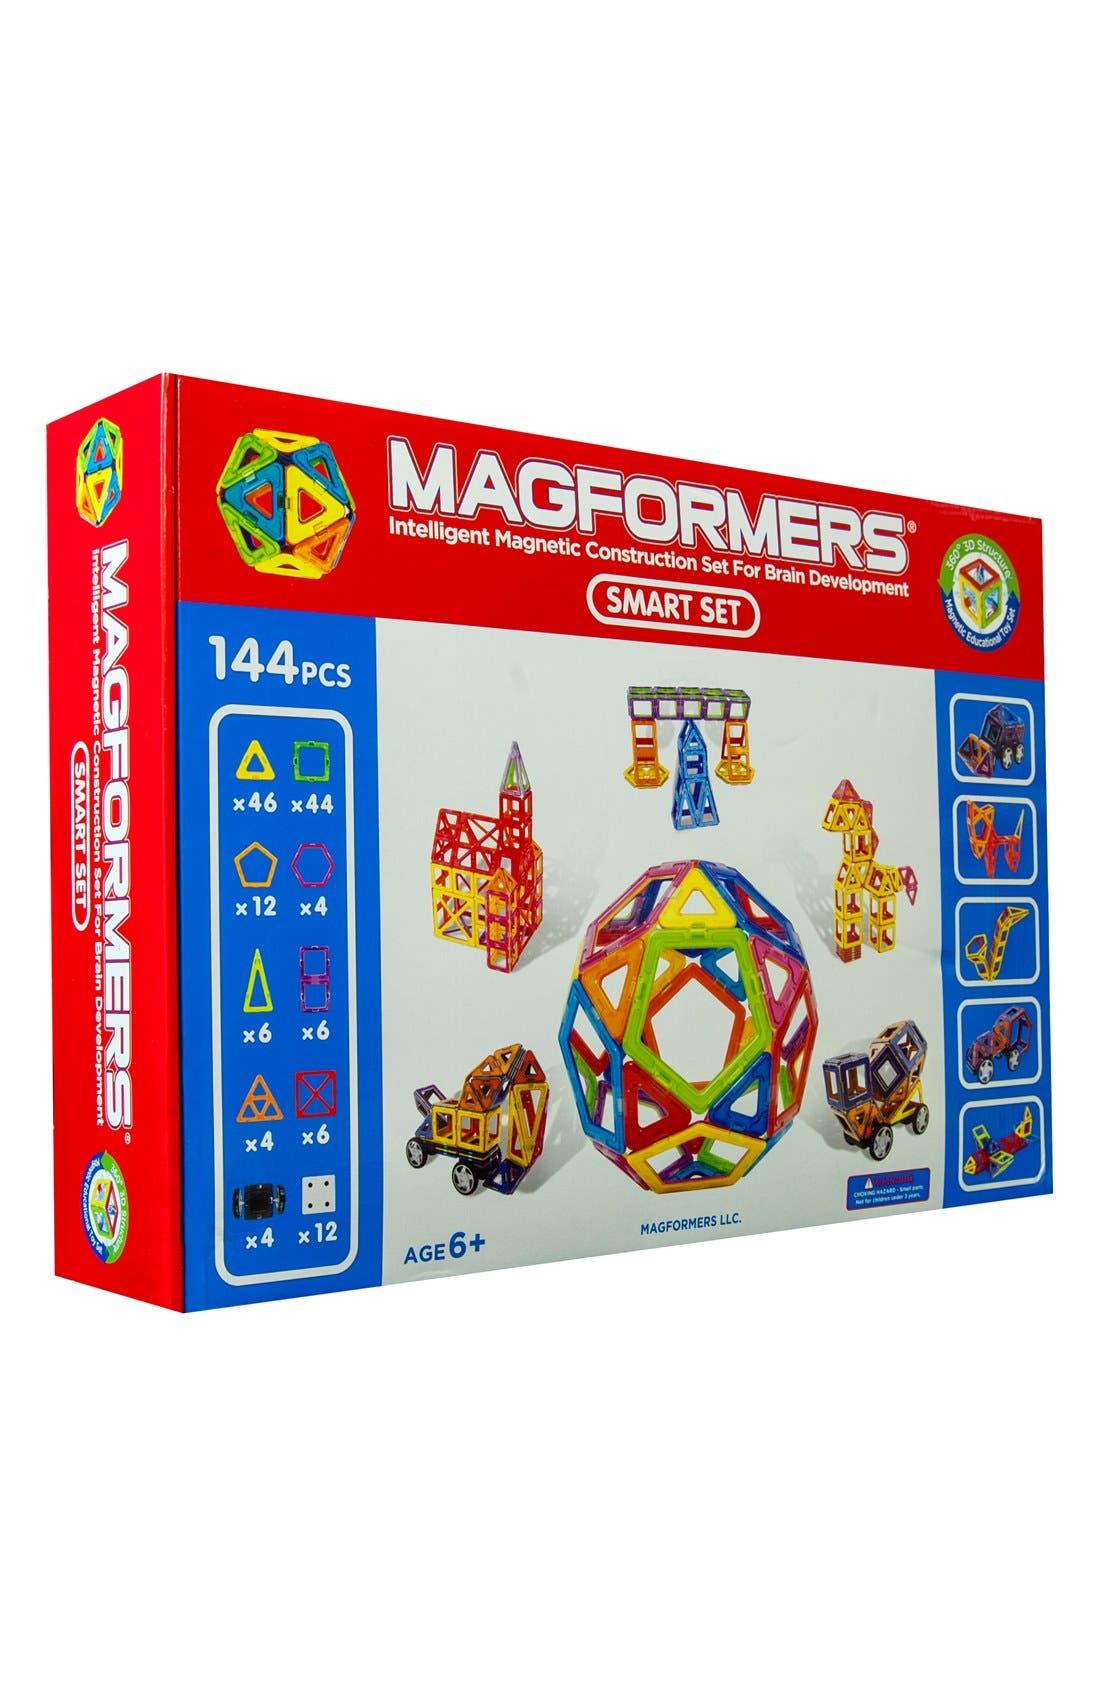 MAGFORMERS 'Smart ' Construction Set